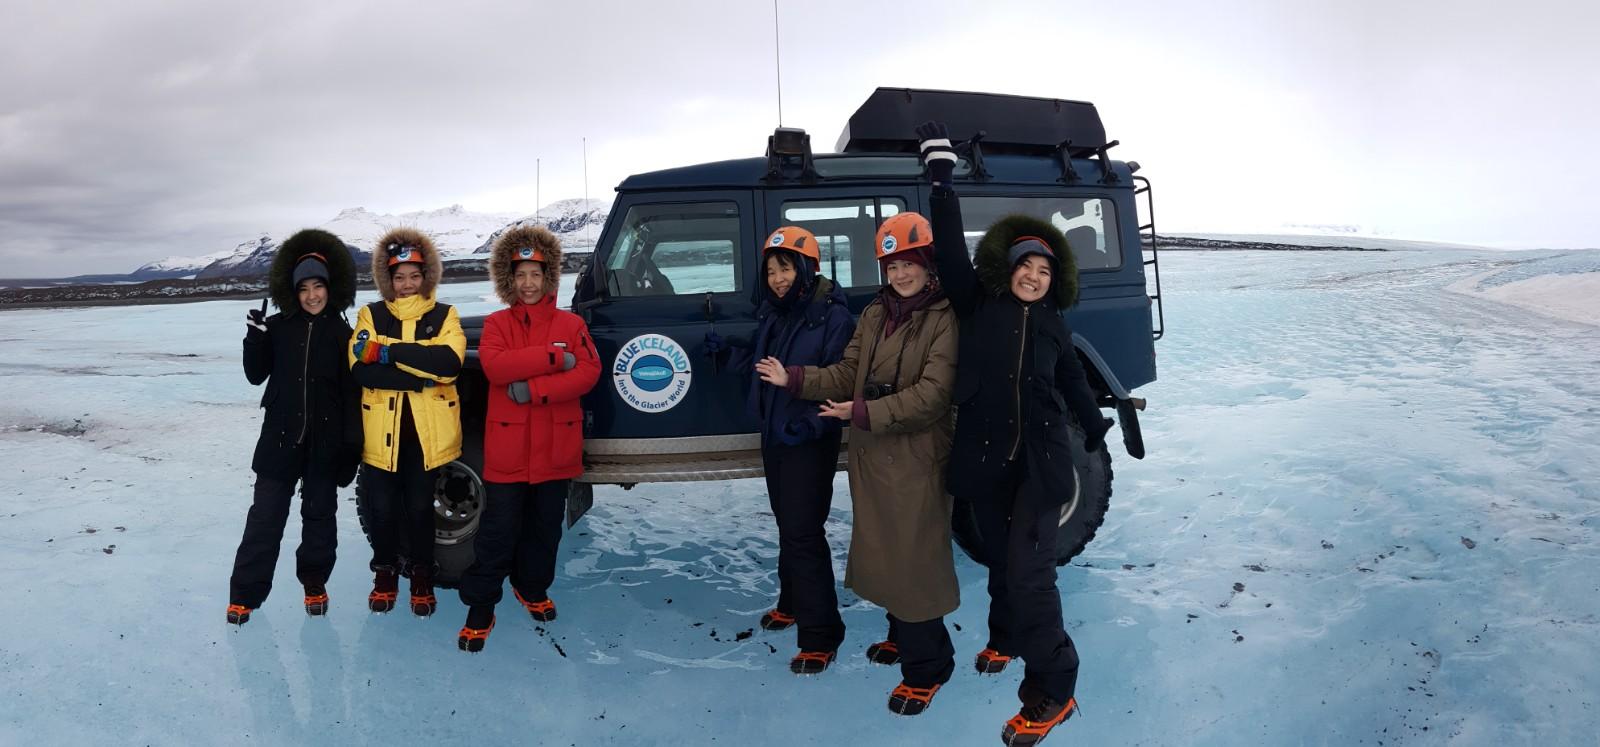 Ice Cave group - Blue Iceland glacier tour, Vatnajökull, Iceland.